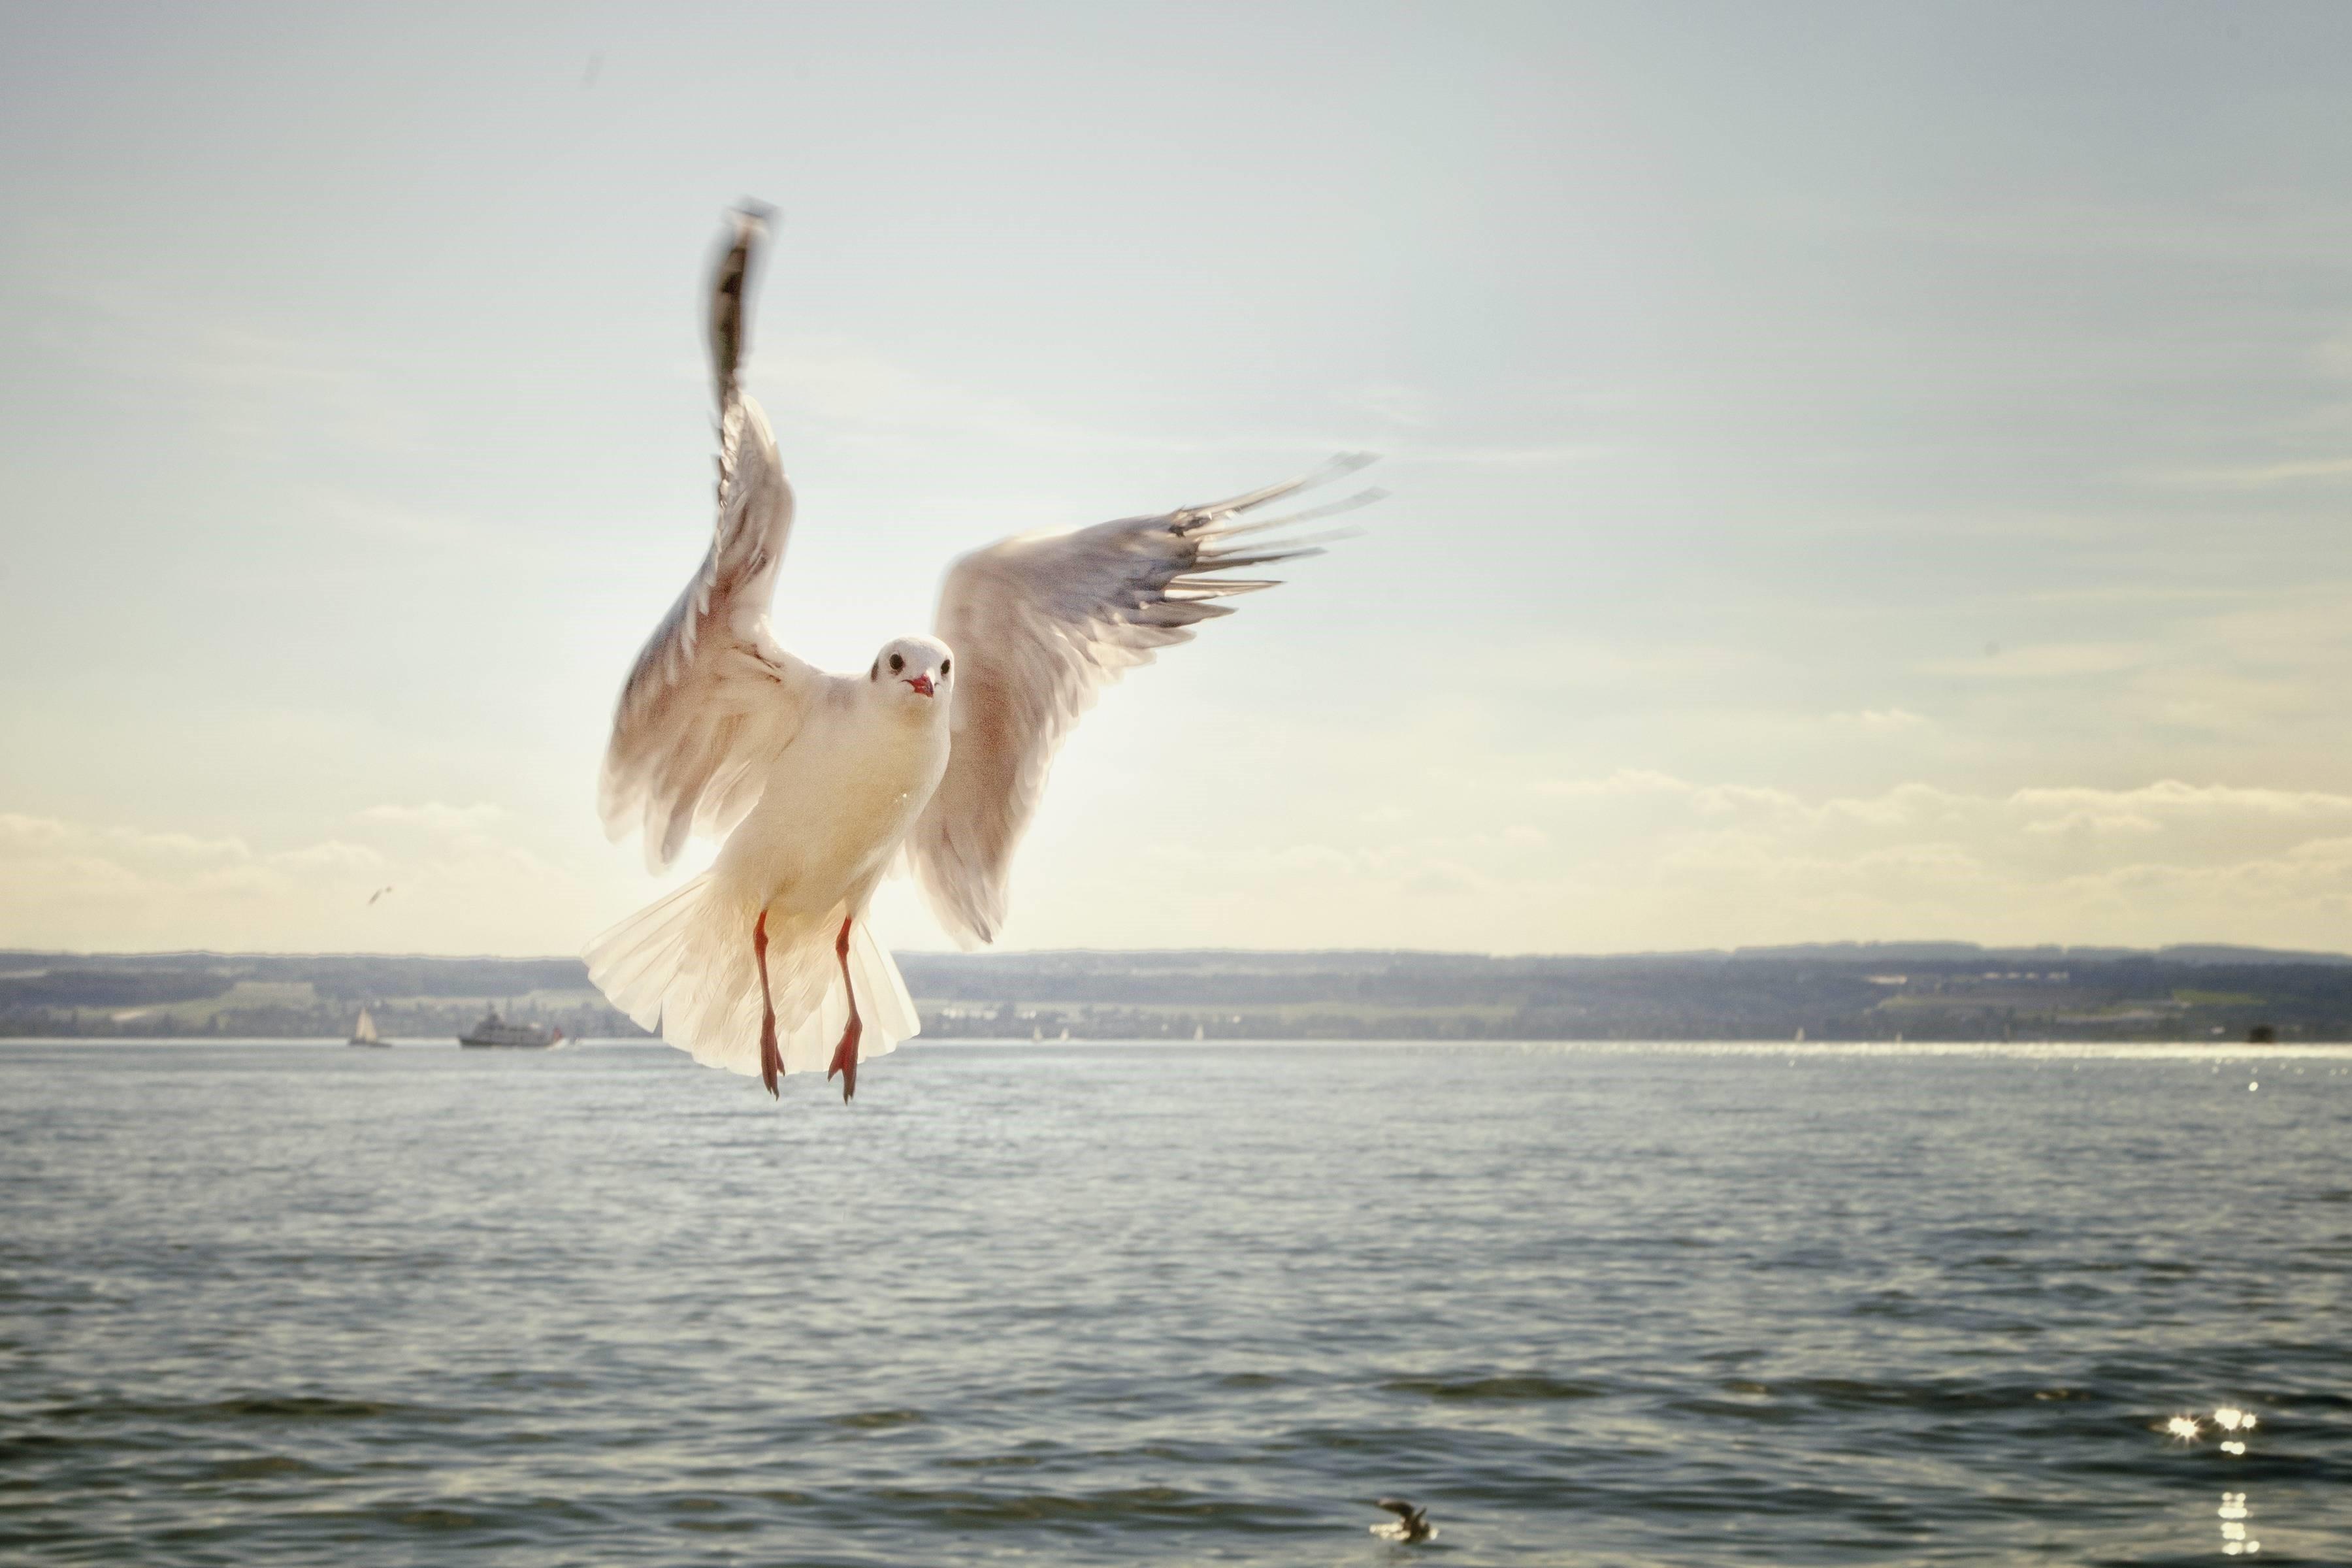 Flying Bird Live , HD Wallpaper & Backgrounds